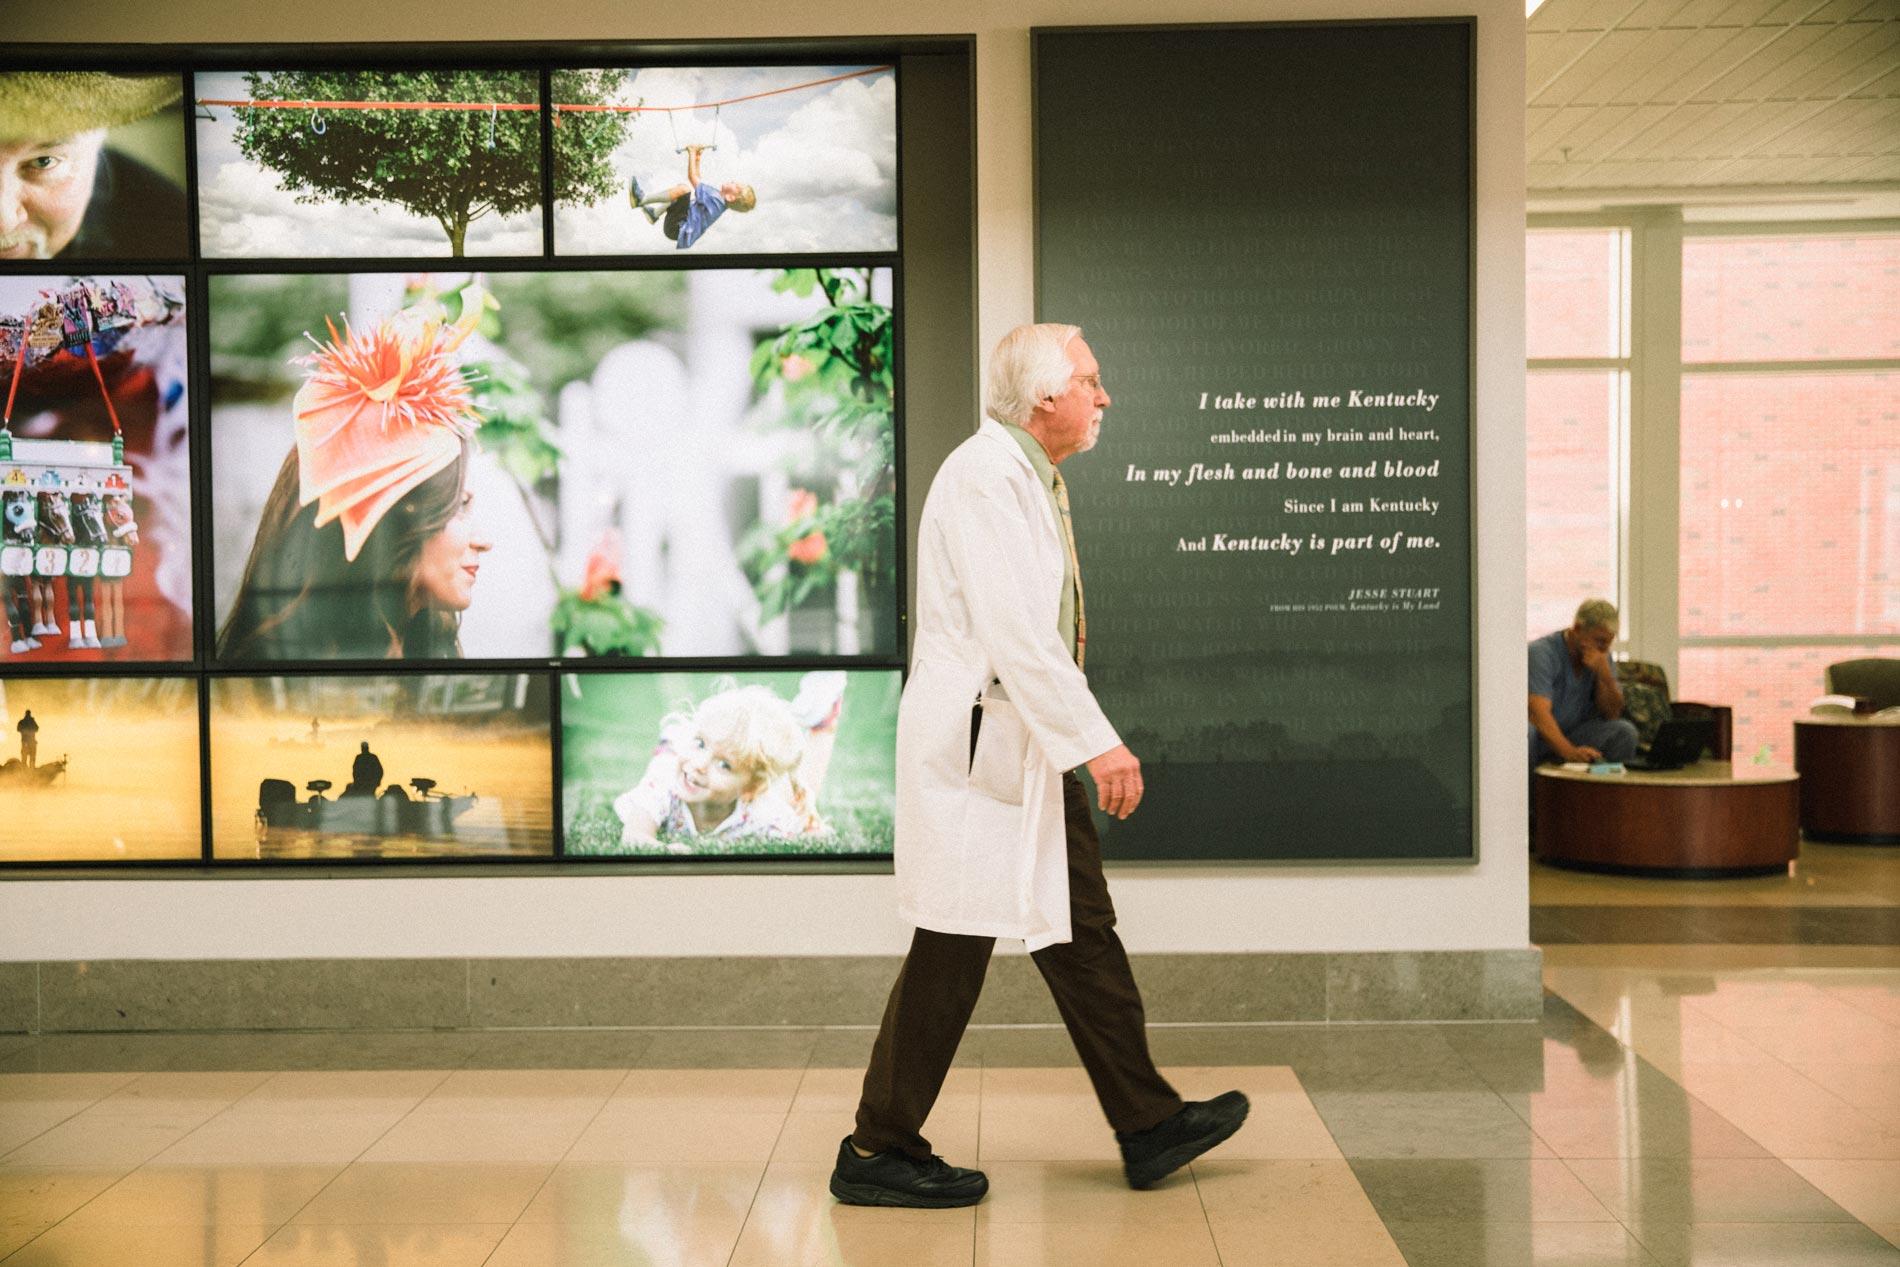 Dr. Ed Kasarskis walking in the Kentucky Neuroscience Institute